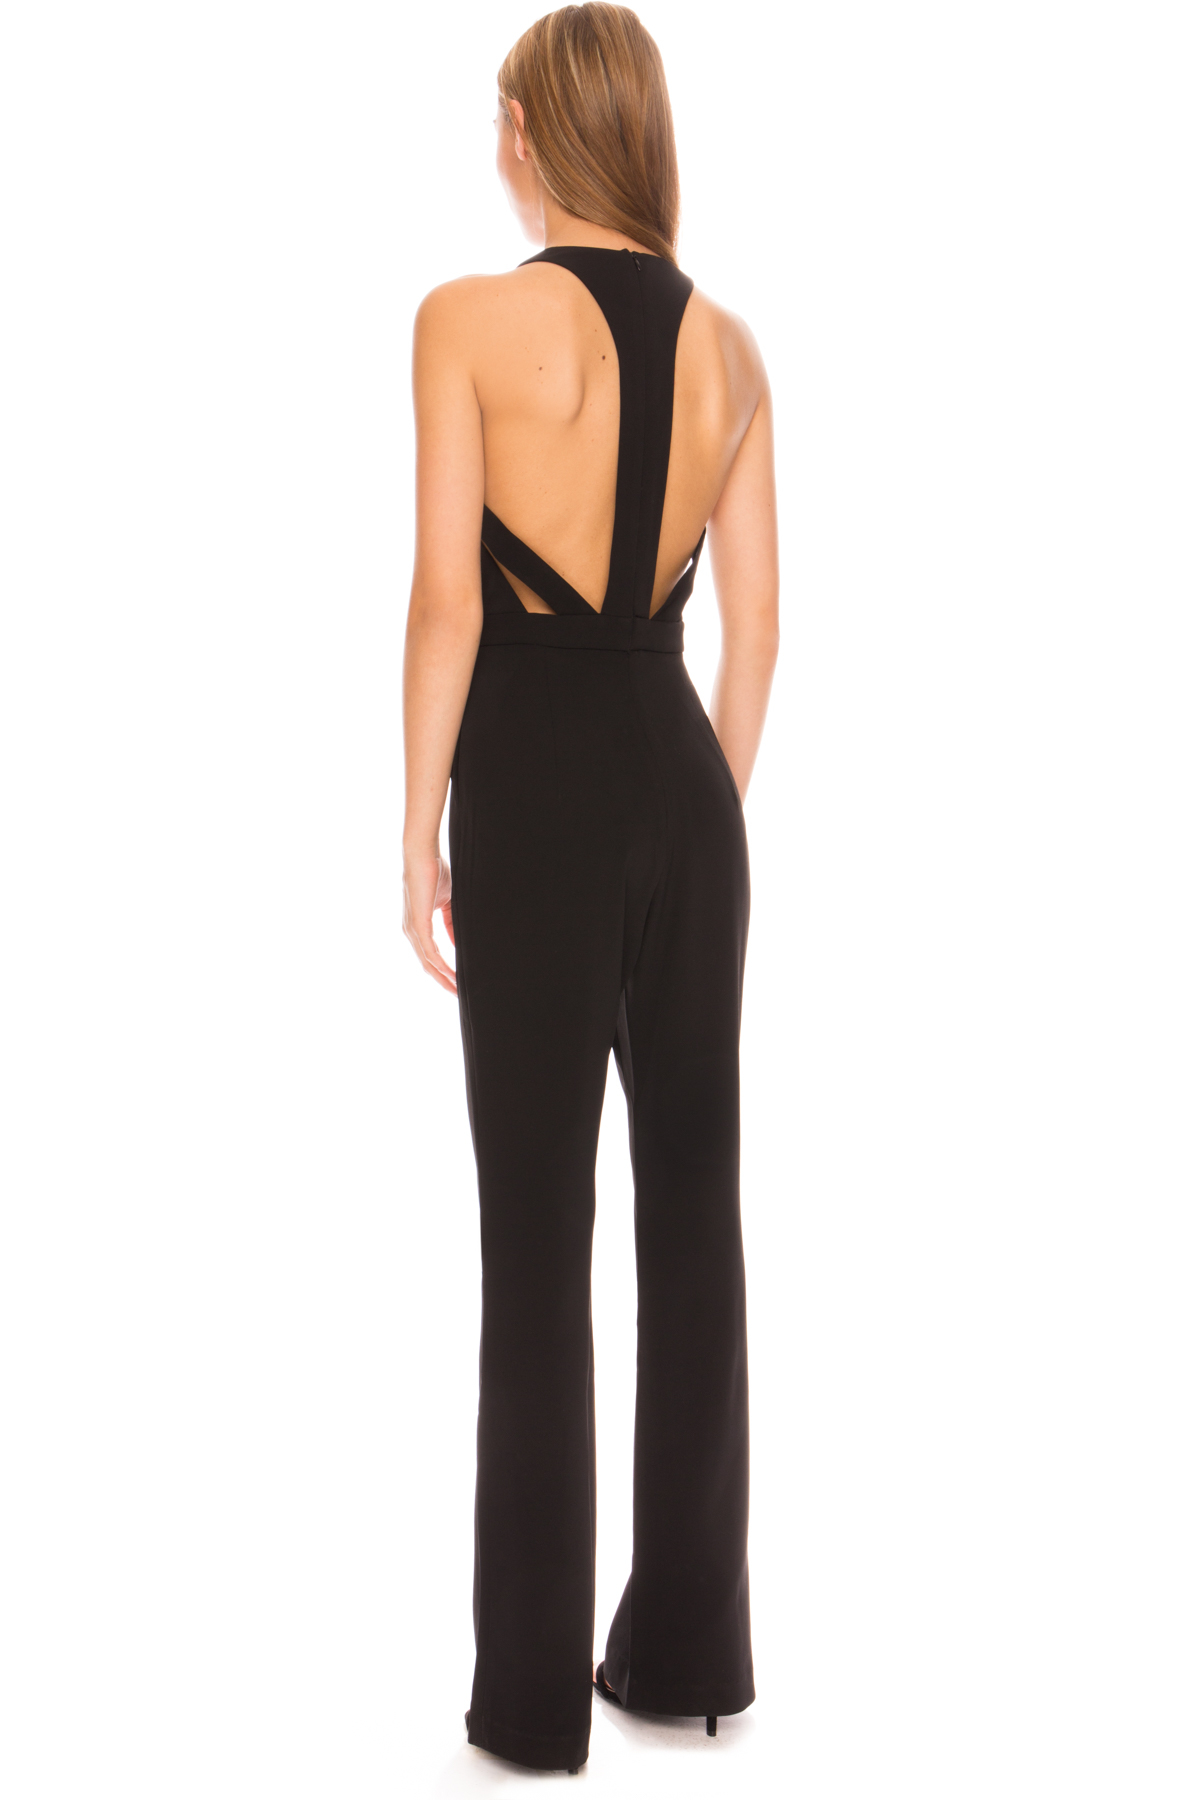 cc22eef779 Lyst - Finders Keepers In Line Jumpsuit in Black